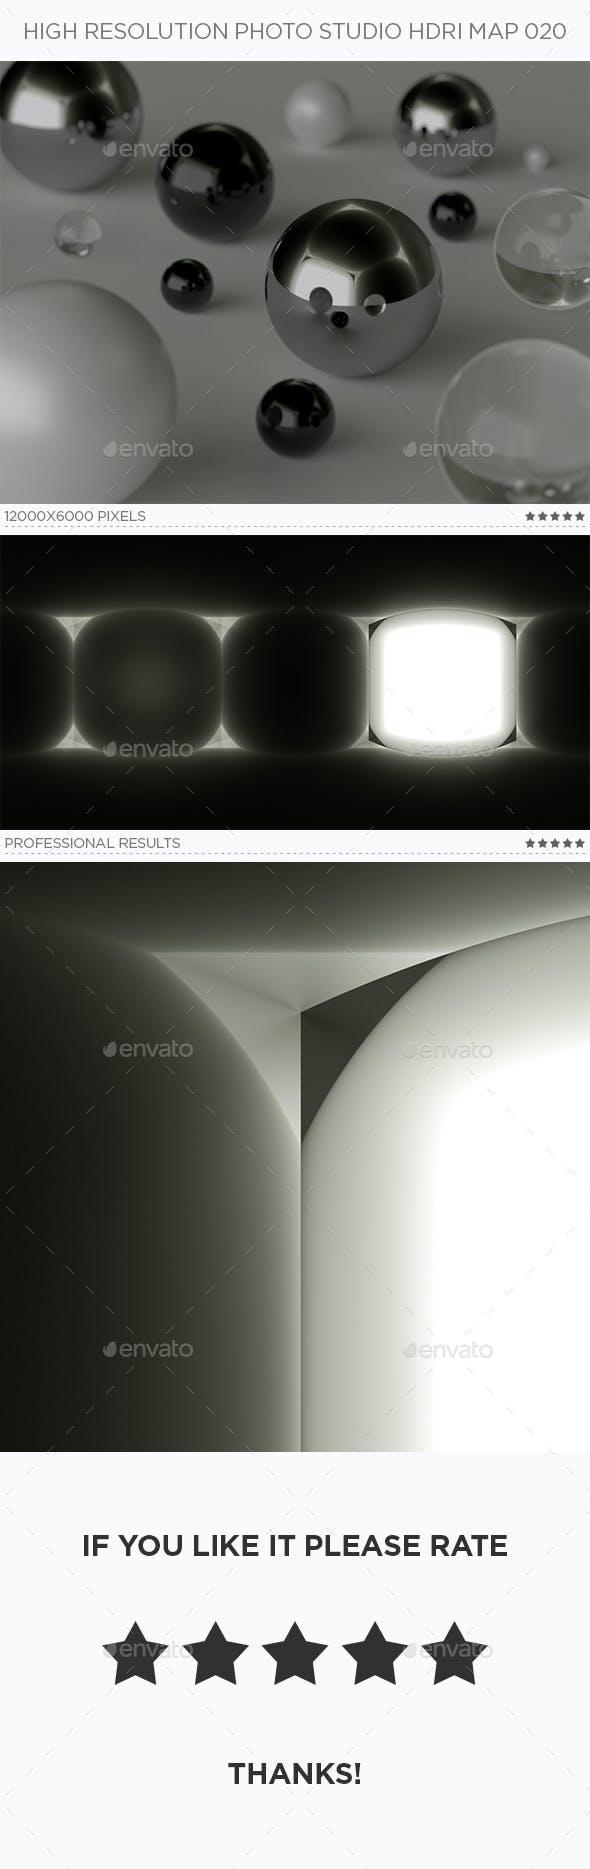 High Resolution Photo Studio HDRi Map 020 - 3DOcean Item for Sale